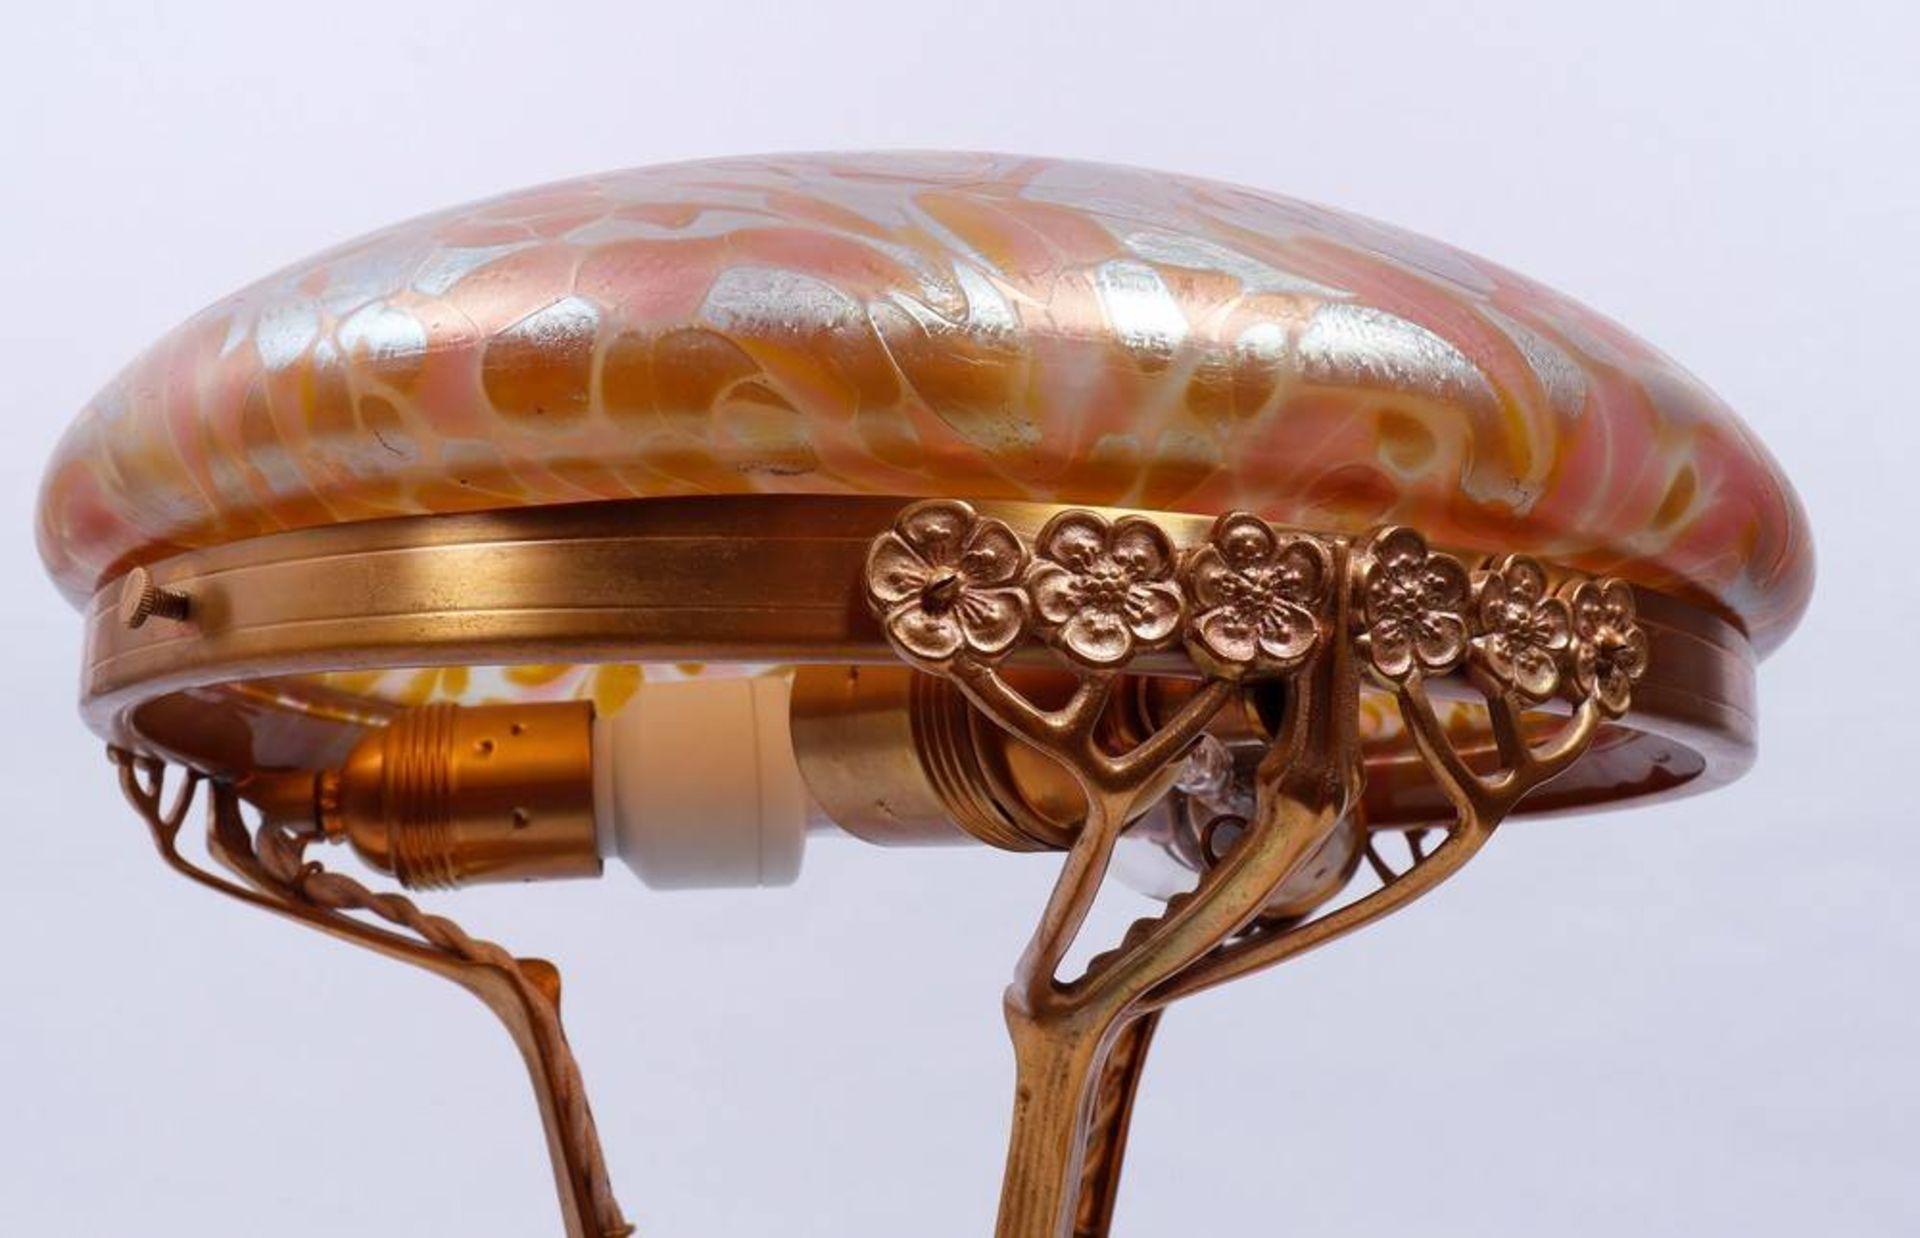 Art Nouveau table lamp, probably Loetz, 1st half 20th C. - Image 5 of 6